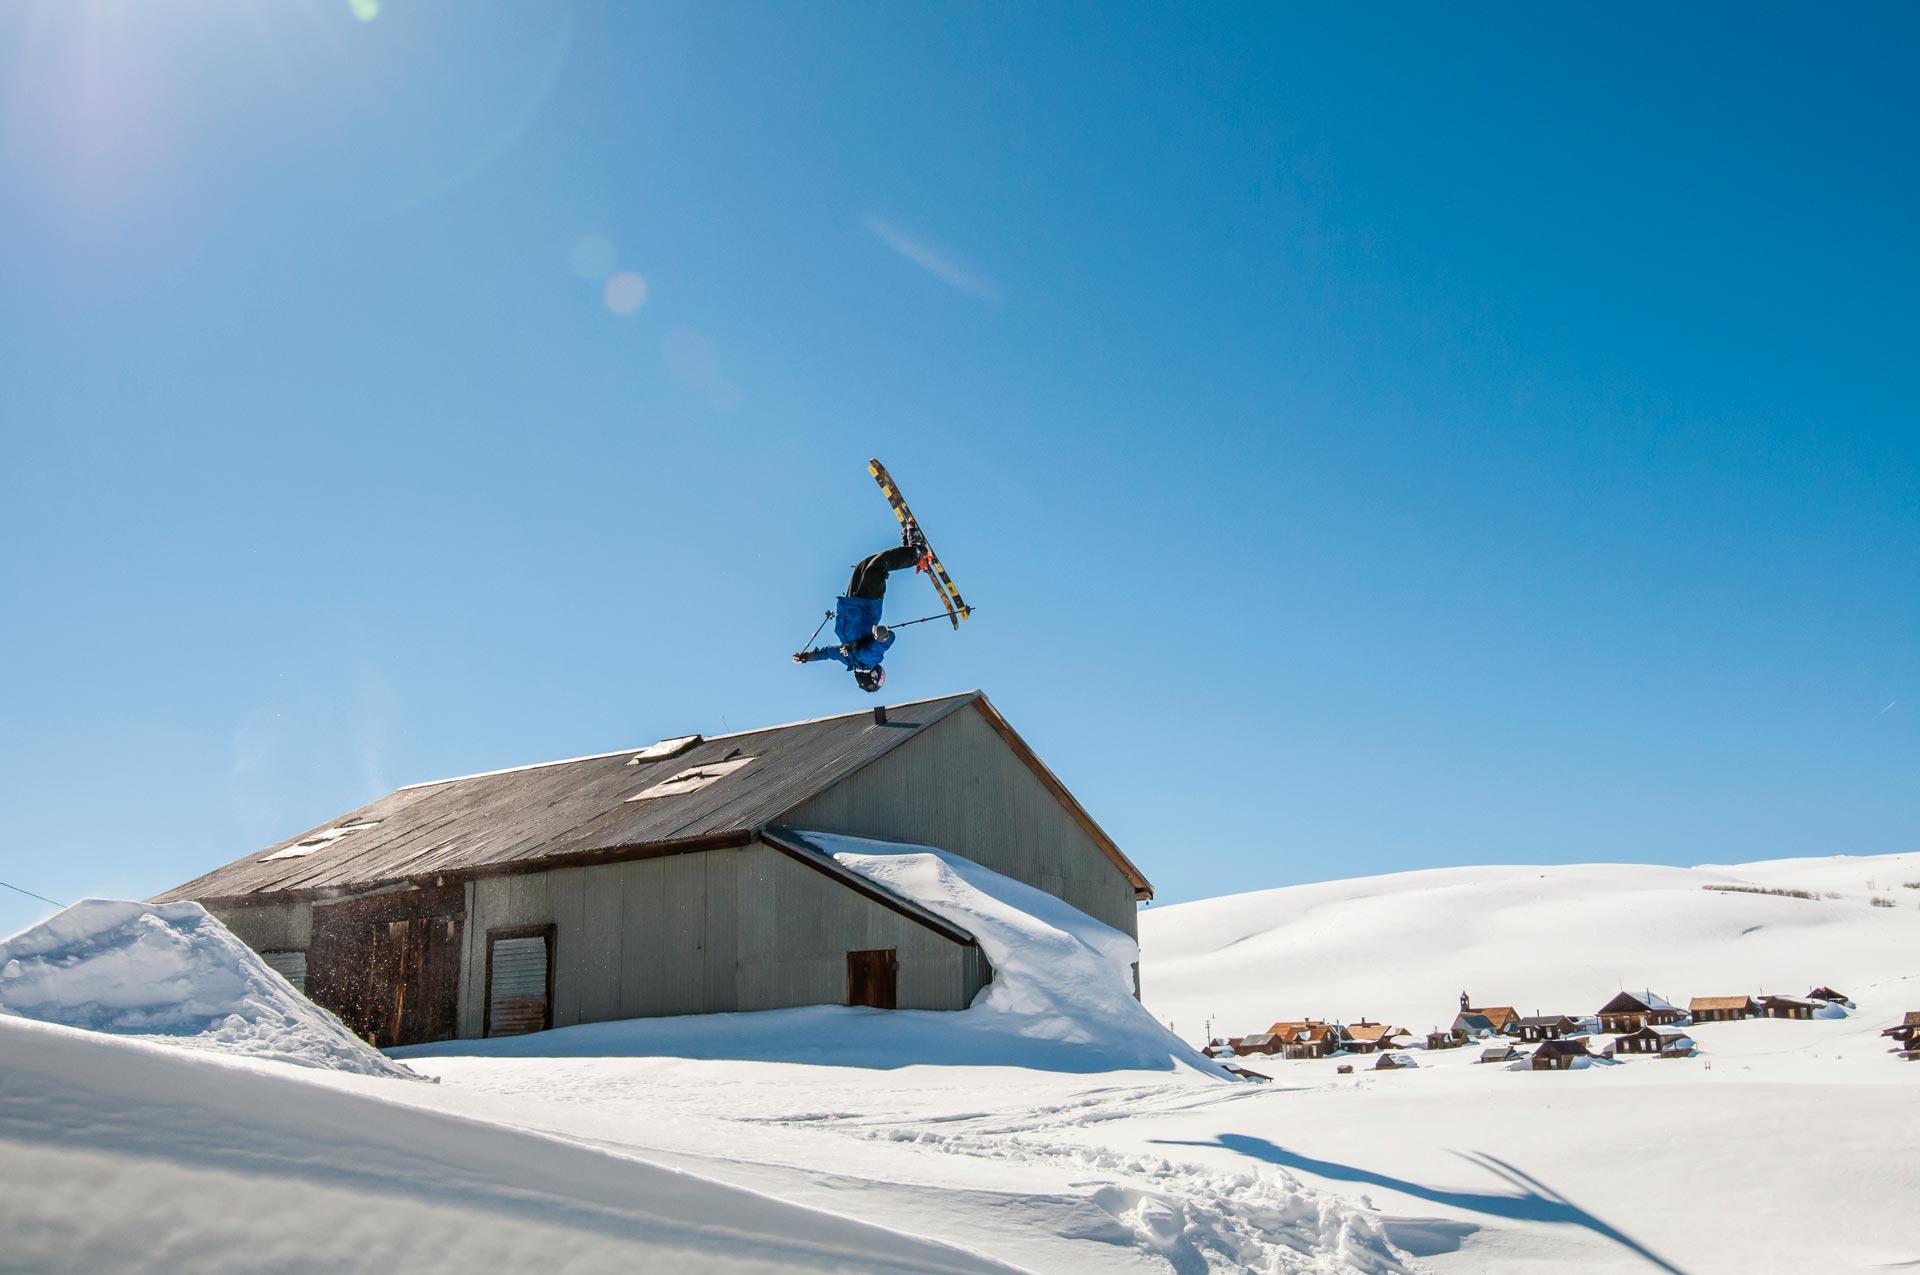 Cody mit dem Backy in der Geisterstadt - Foto: Red Bull Content Pool